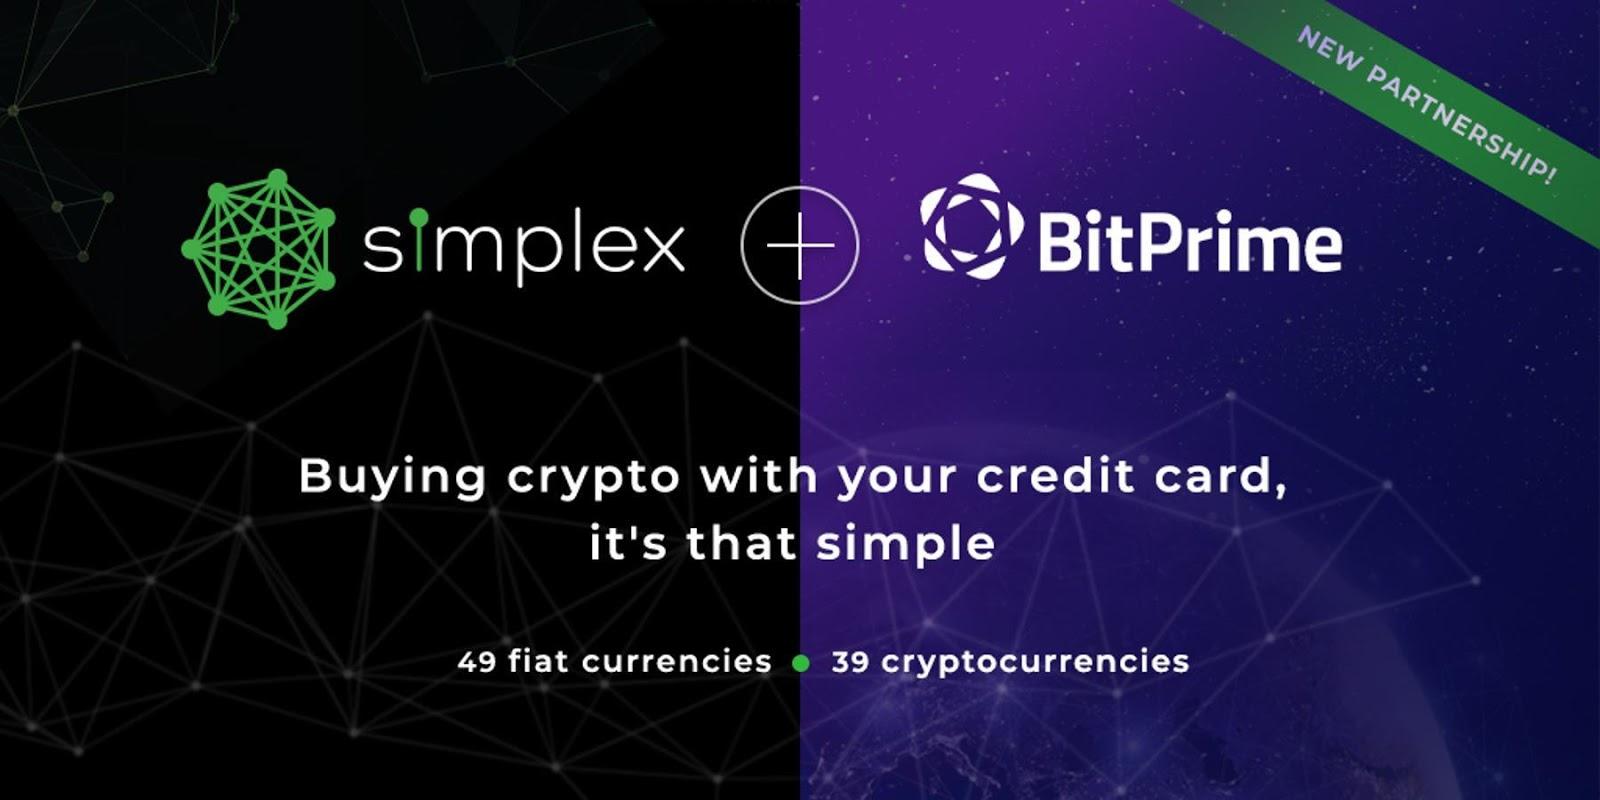 BitPrime Facilitates Crypto Purchases via Credit Card Through Simplex Partnership